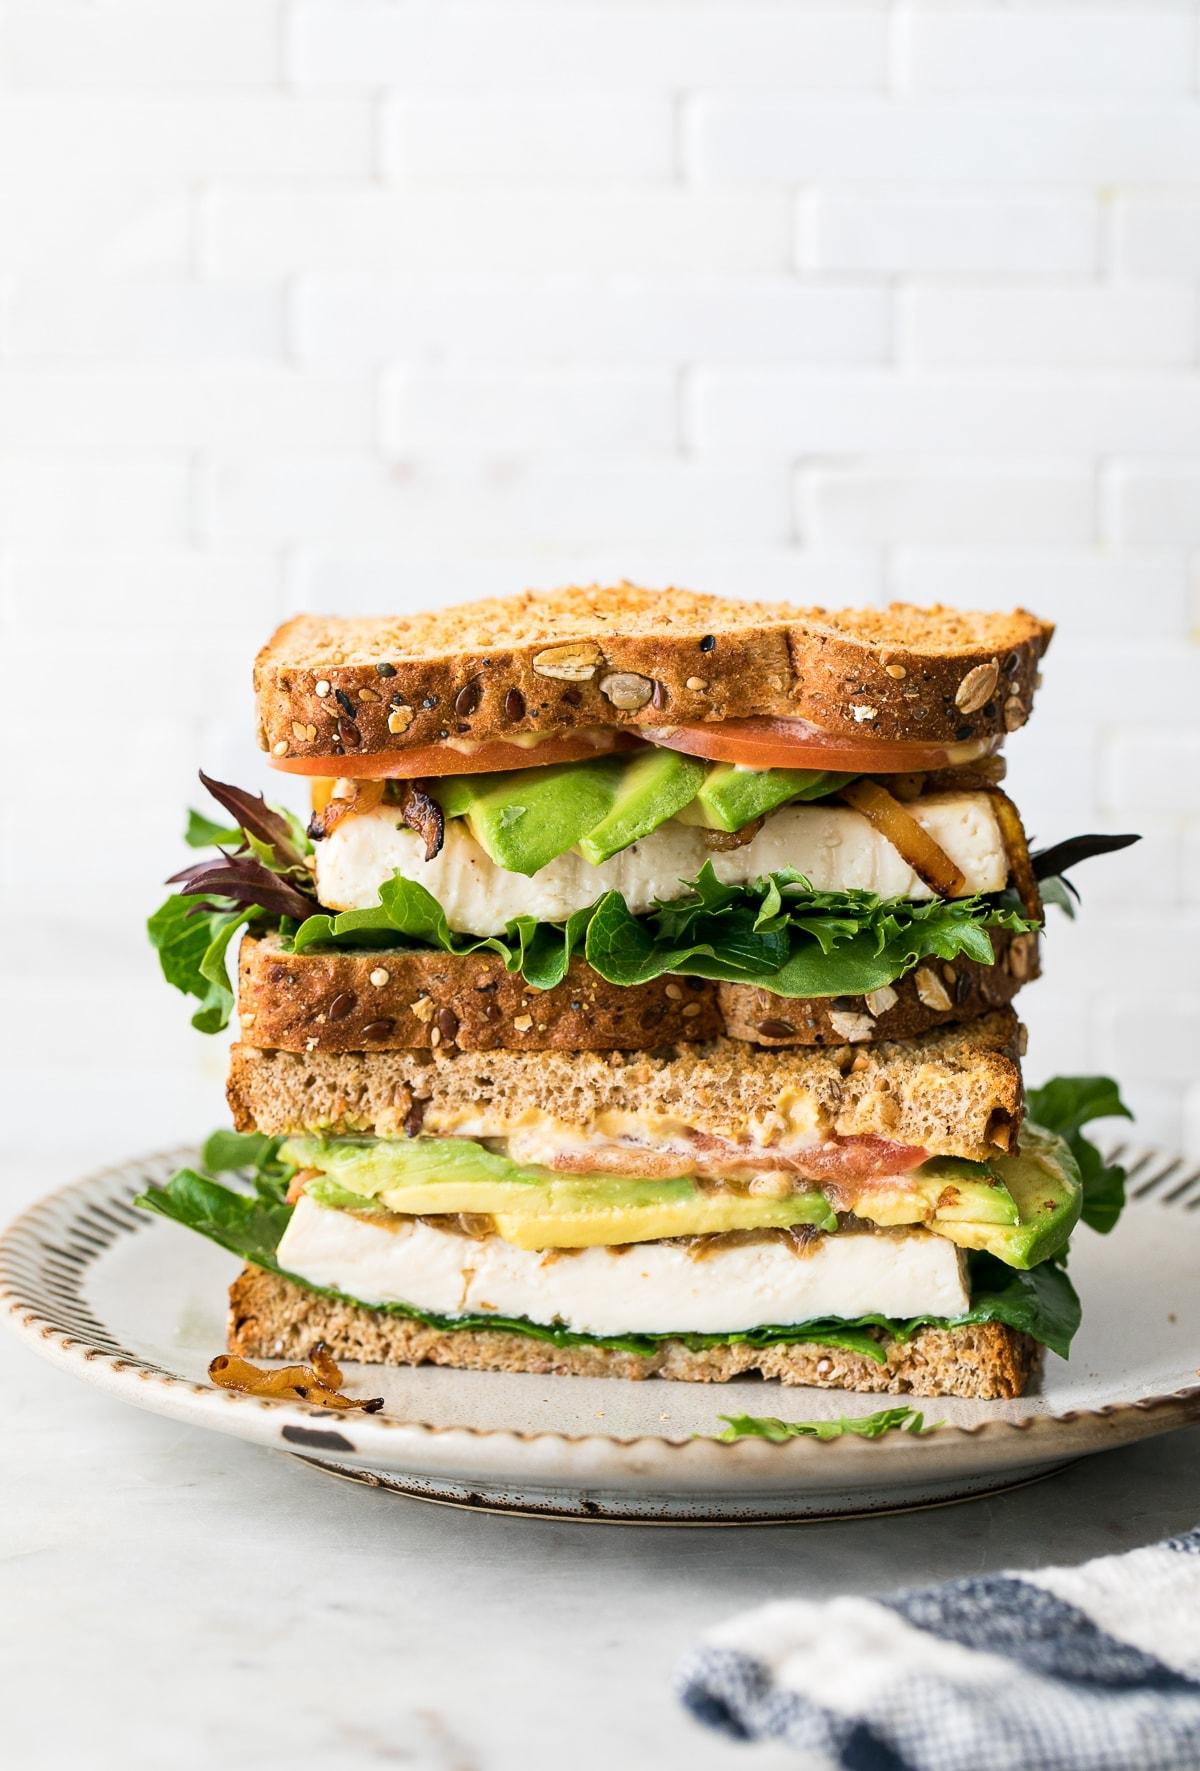 Toasted Avocado Tofu Sandwich Sauteed Onions The Simple Veganista